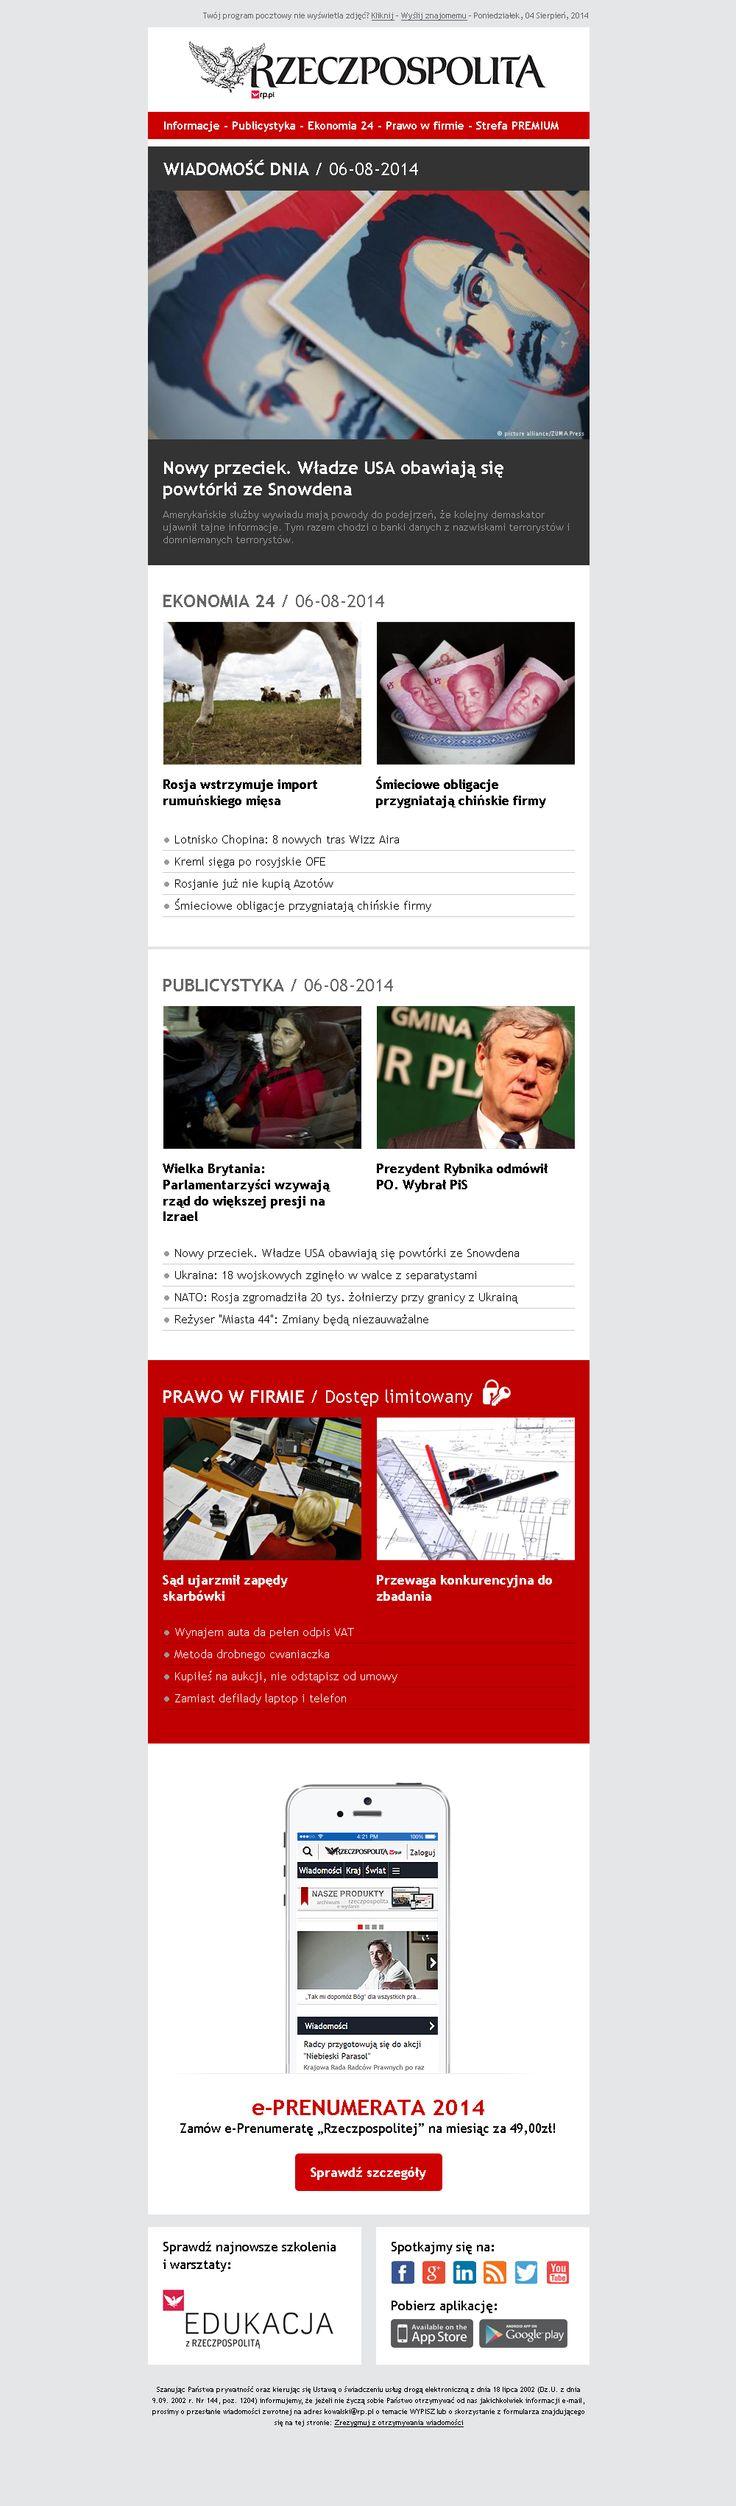 Rzeczpospolita newsletter Webdesign #webdesign #web #design #piotr #wolniewicz #portfolio #inspiration #email #marketing